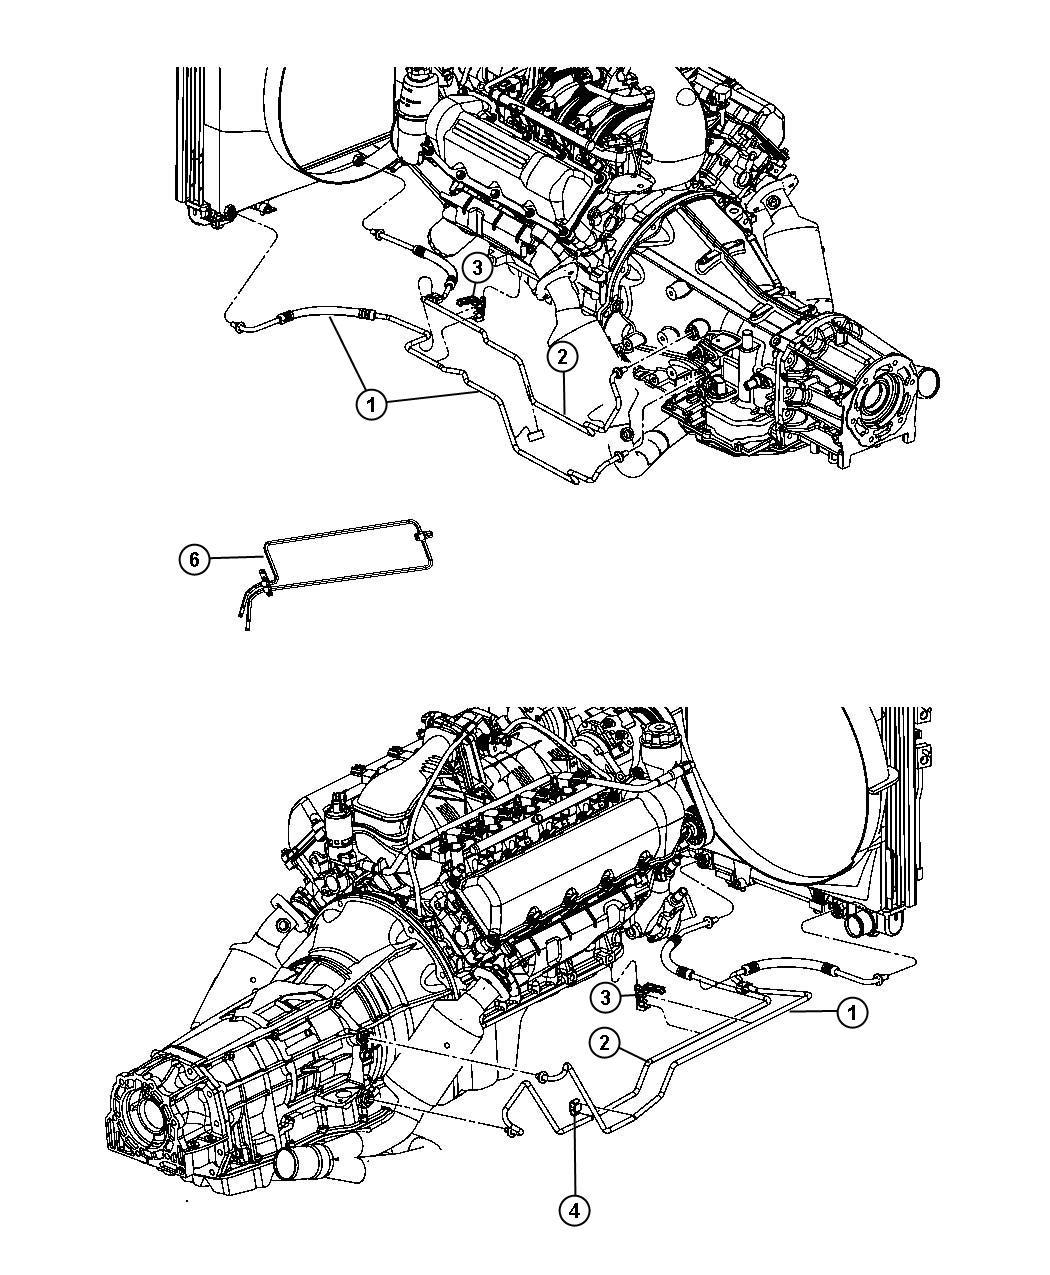 Dodge Dakota Used for: TUBE AND HOSE. Oil Cooler. Pressure